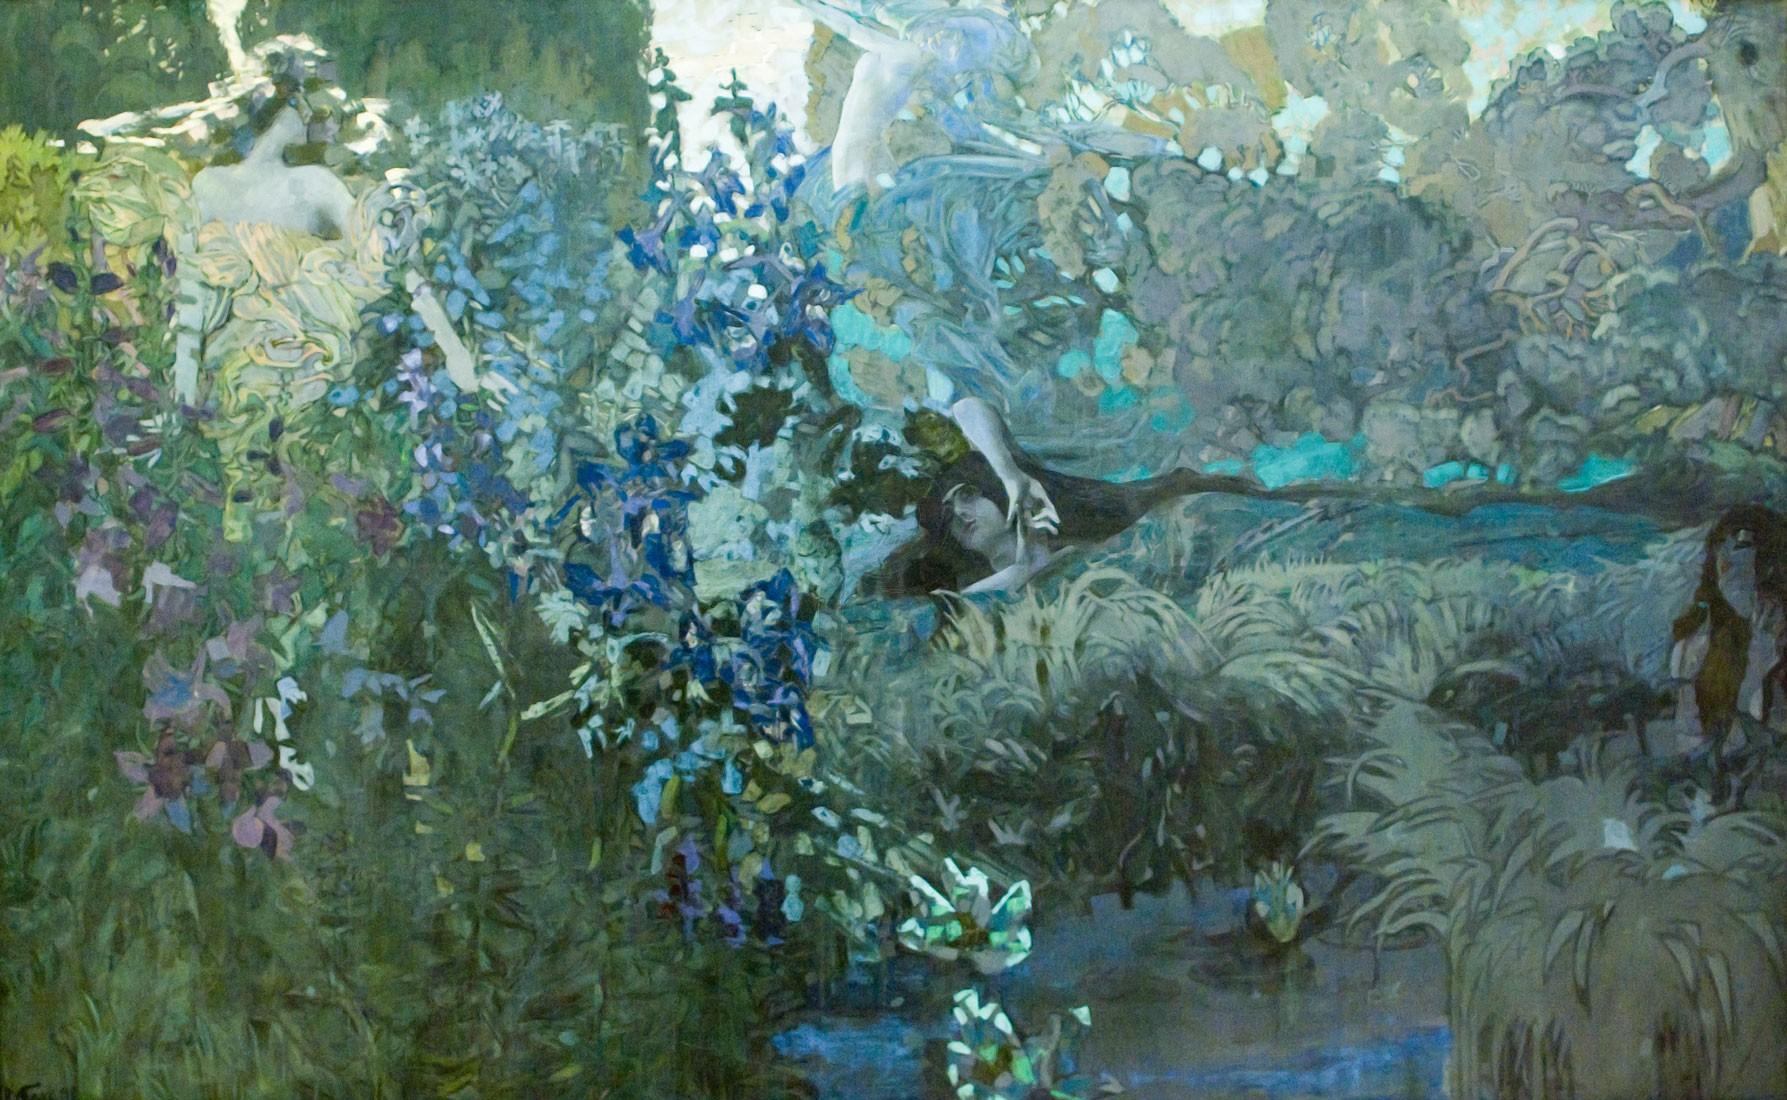 painting_reproduction-mikhail_vrubel-morning_web